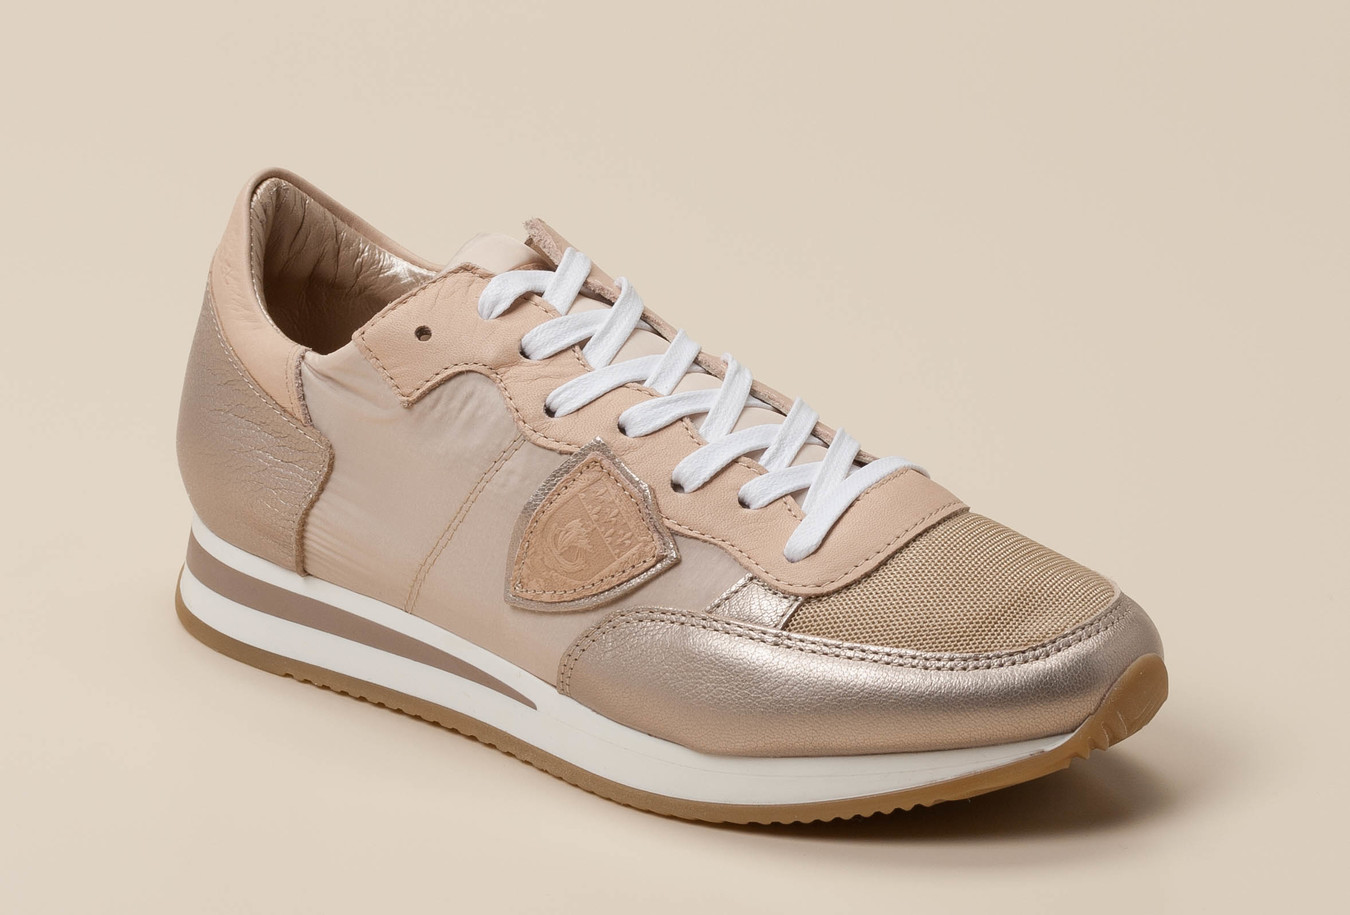 Philippe Model Paris Damen Sneaker in beige kaufen   Zumnorde Online Shop